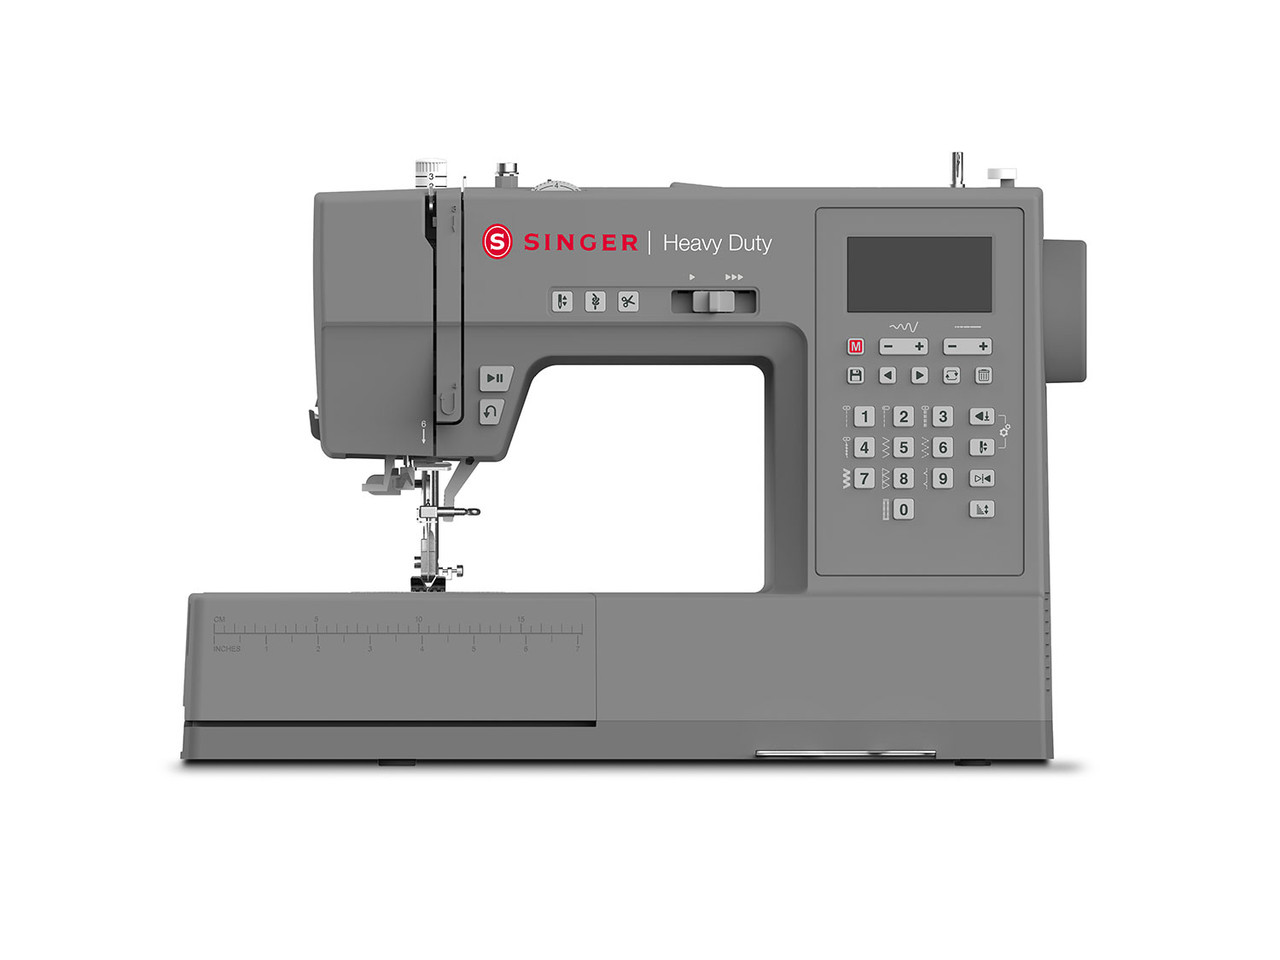 Singer HD6805 Electronic Heavy Duty Sewing Machine